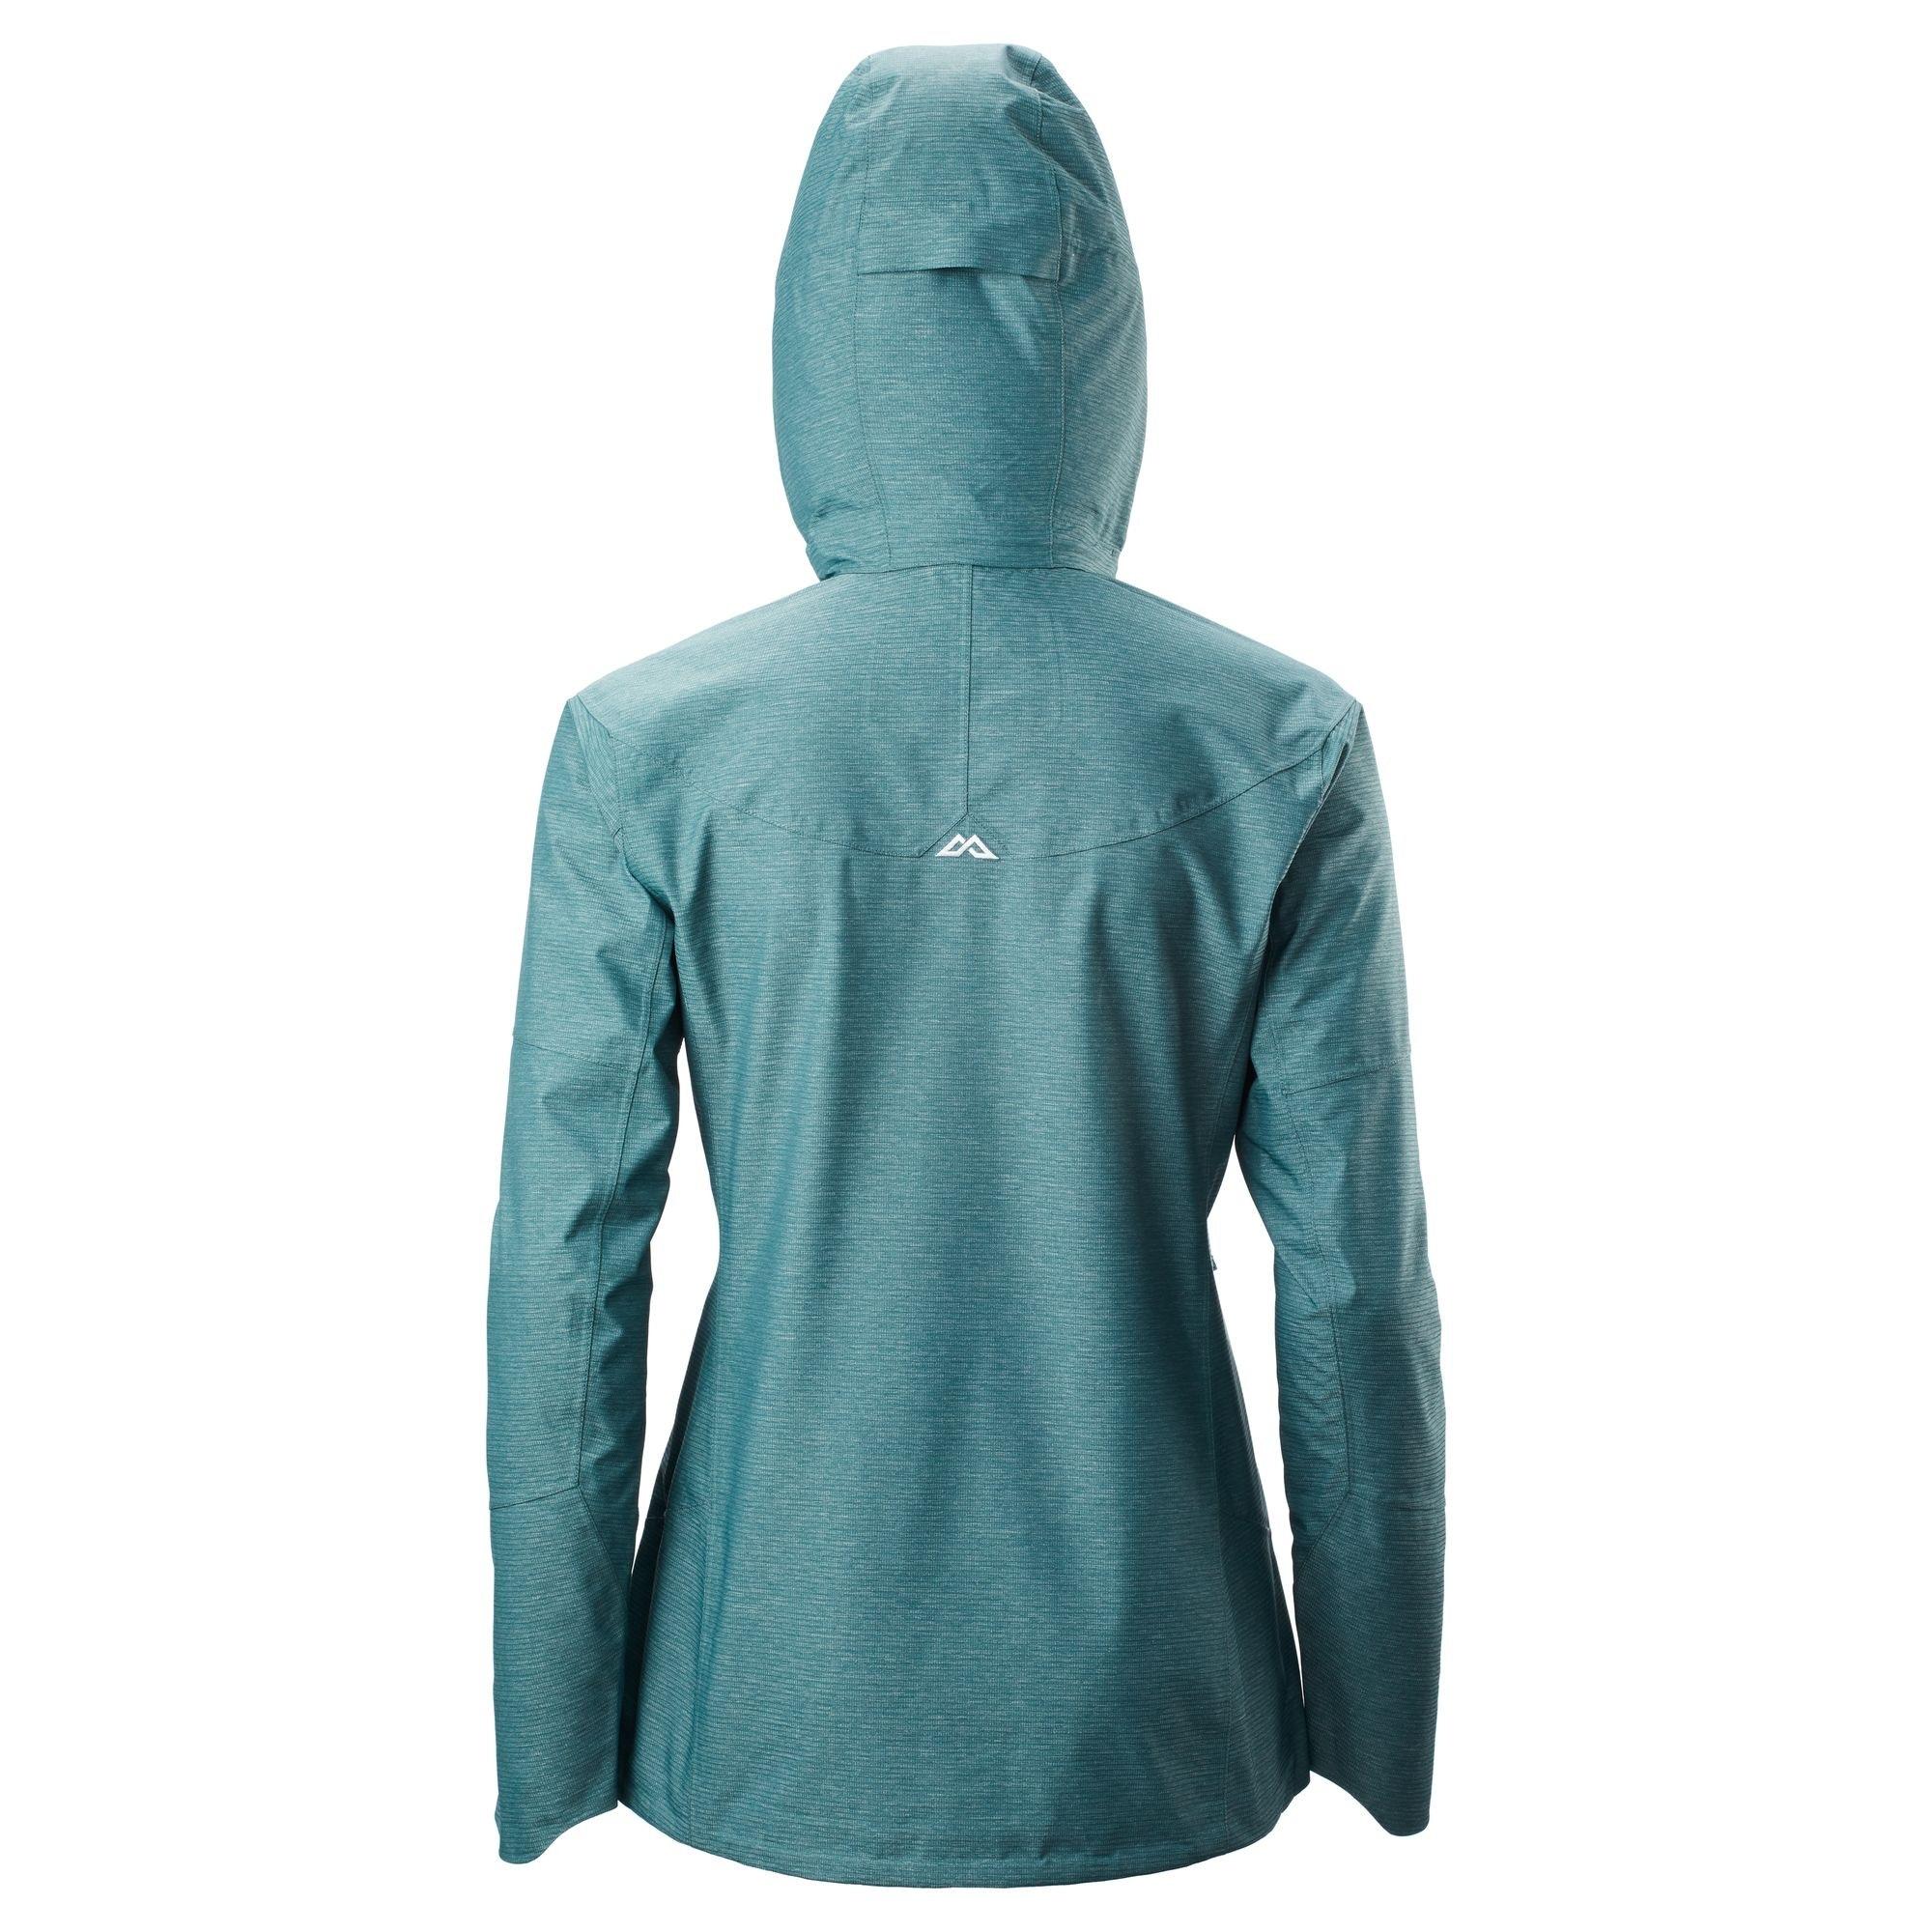 NEW-Kathmandu-Lawrence-Women-039-s-ngx-Windproof-Waterproof-Outdoor-Rain-Jacket-v2 thumbnail 14